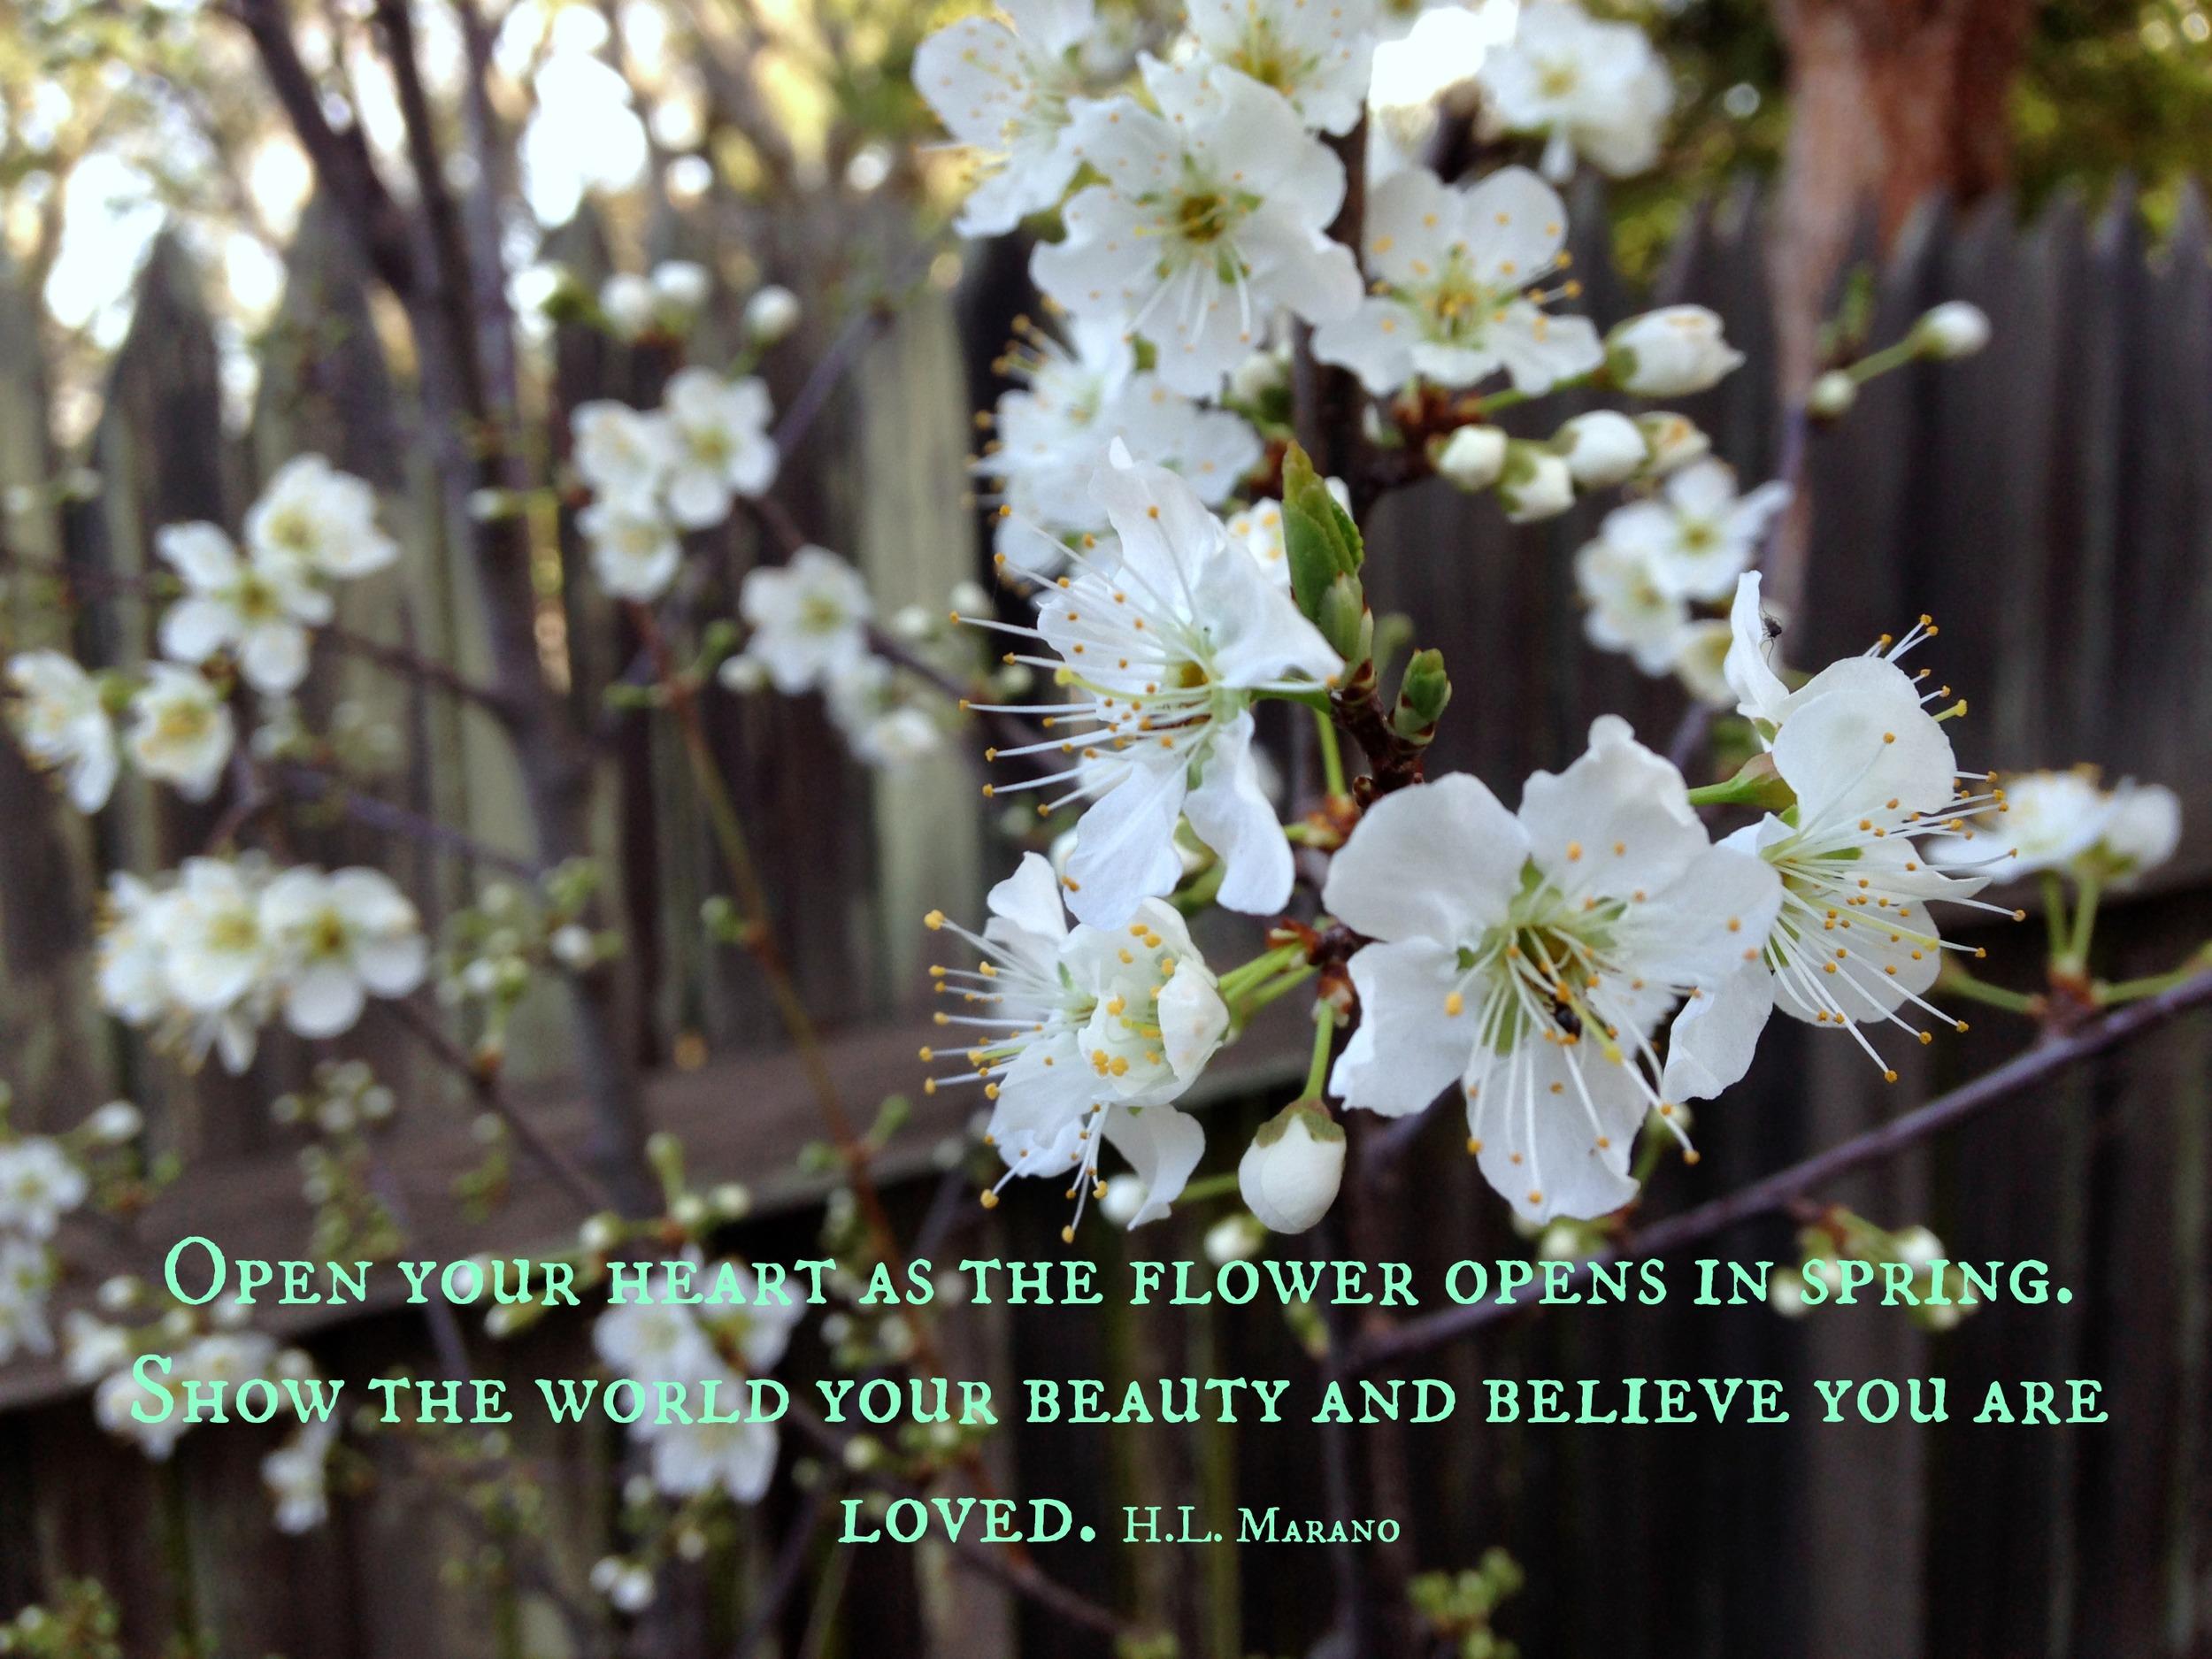 You are loved.jpg.jpg